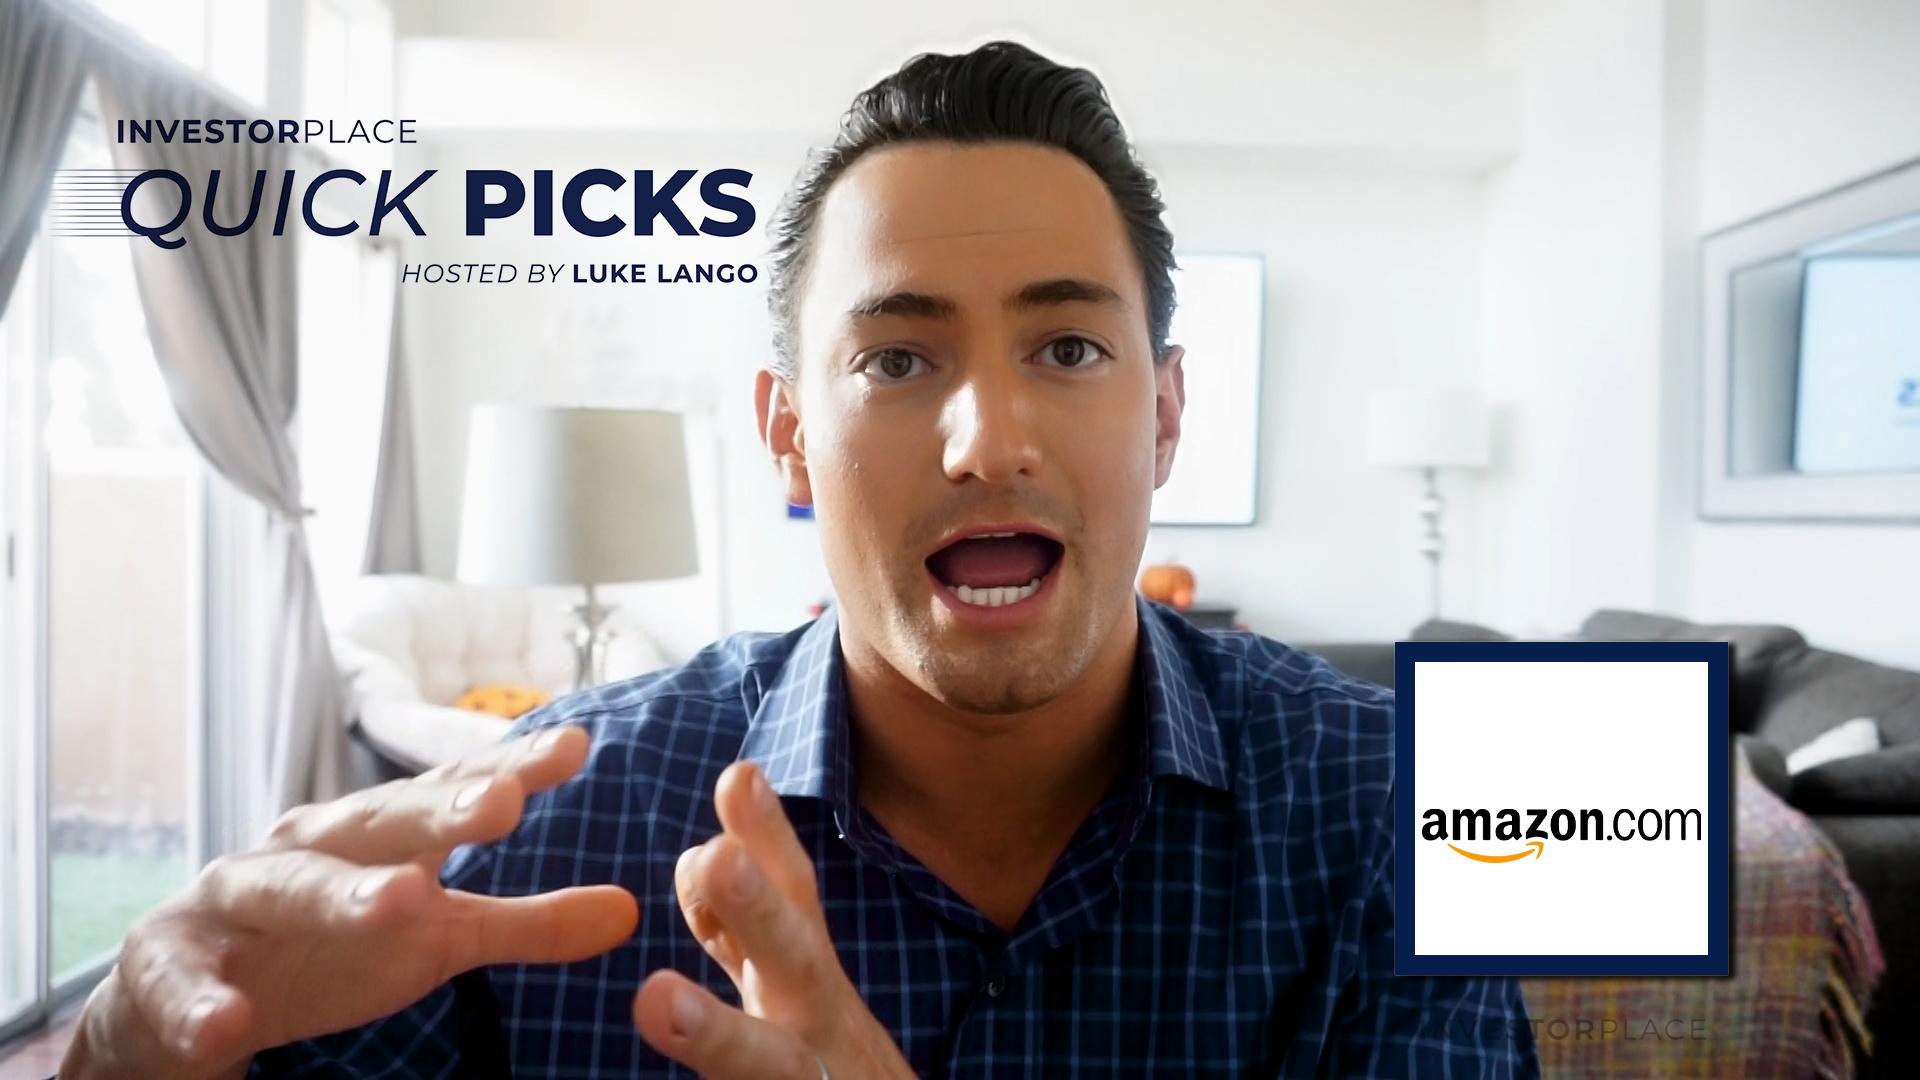 Thumbnail of YouTube video on Amazon